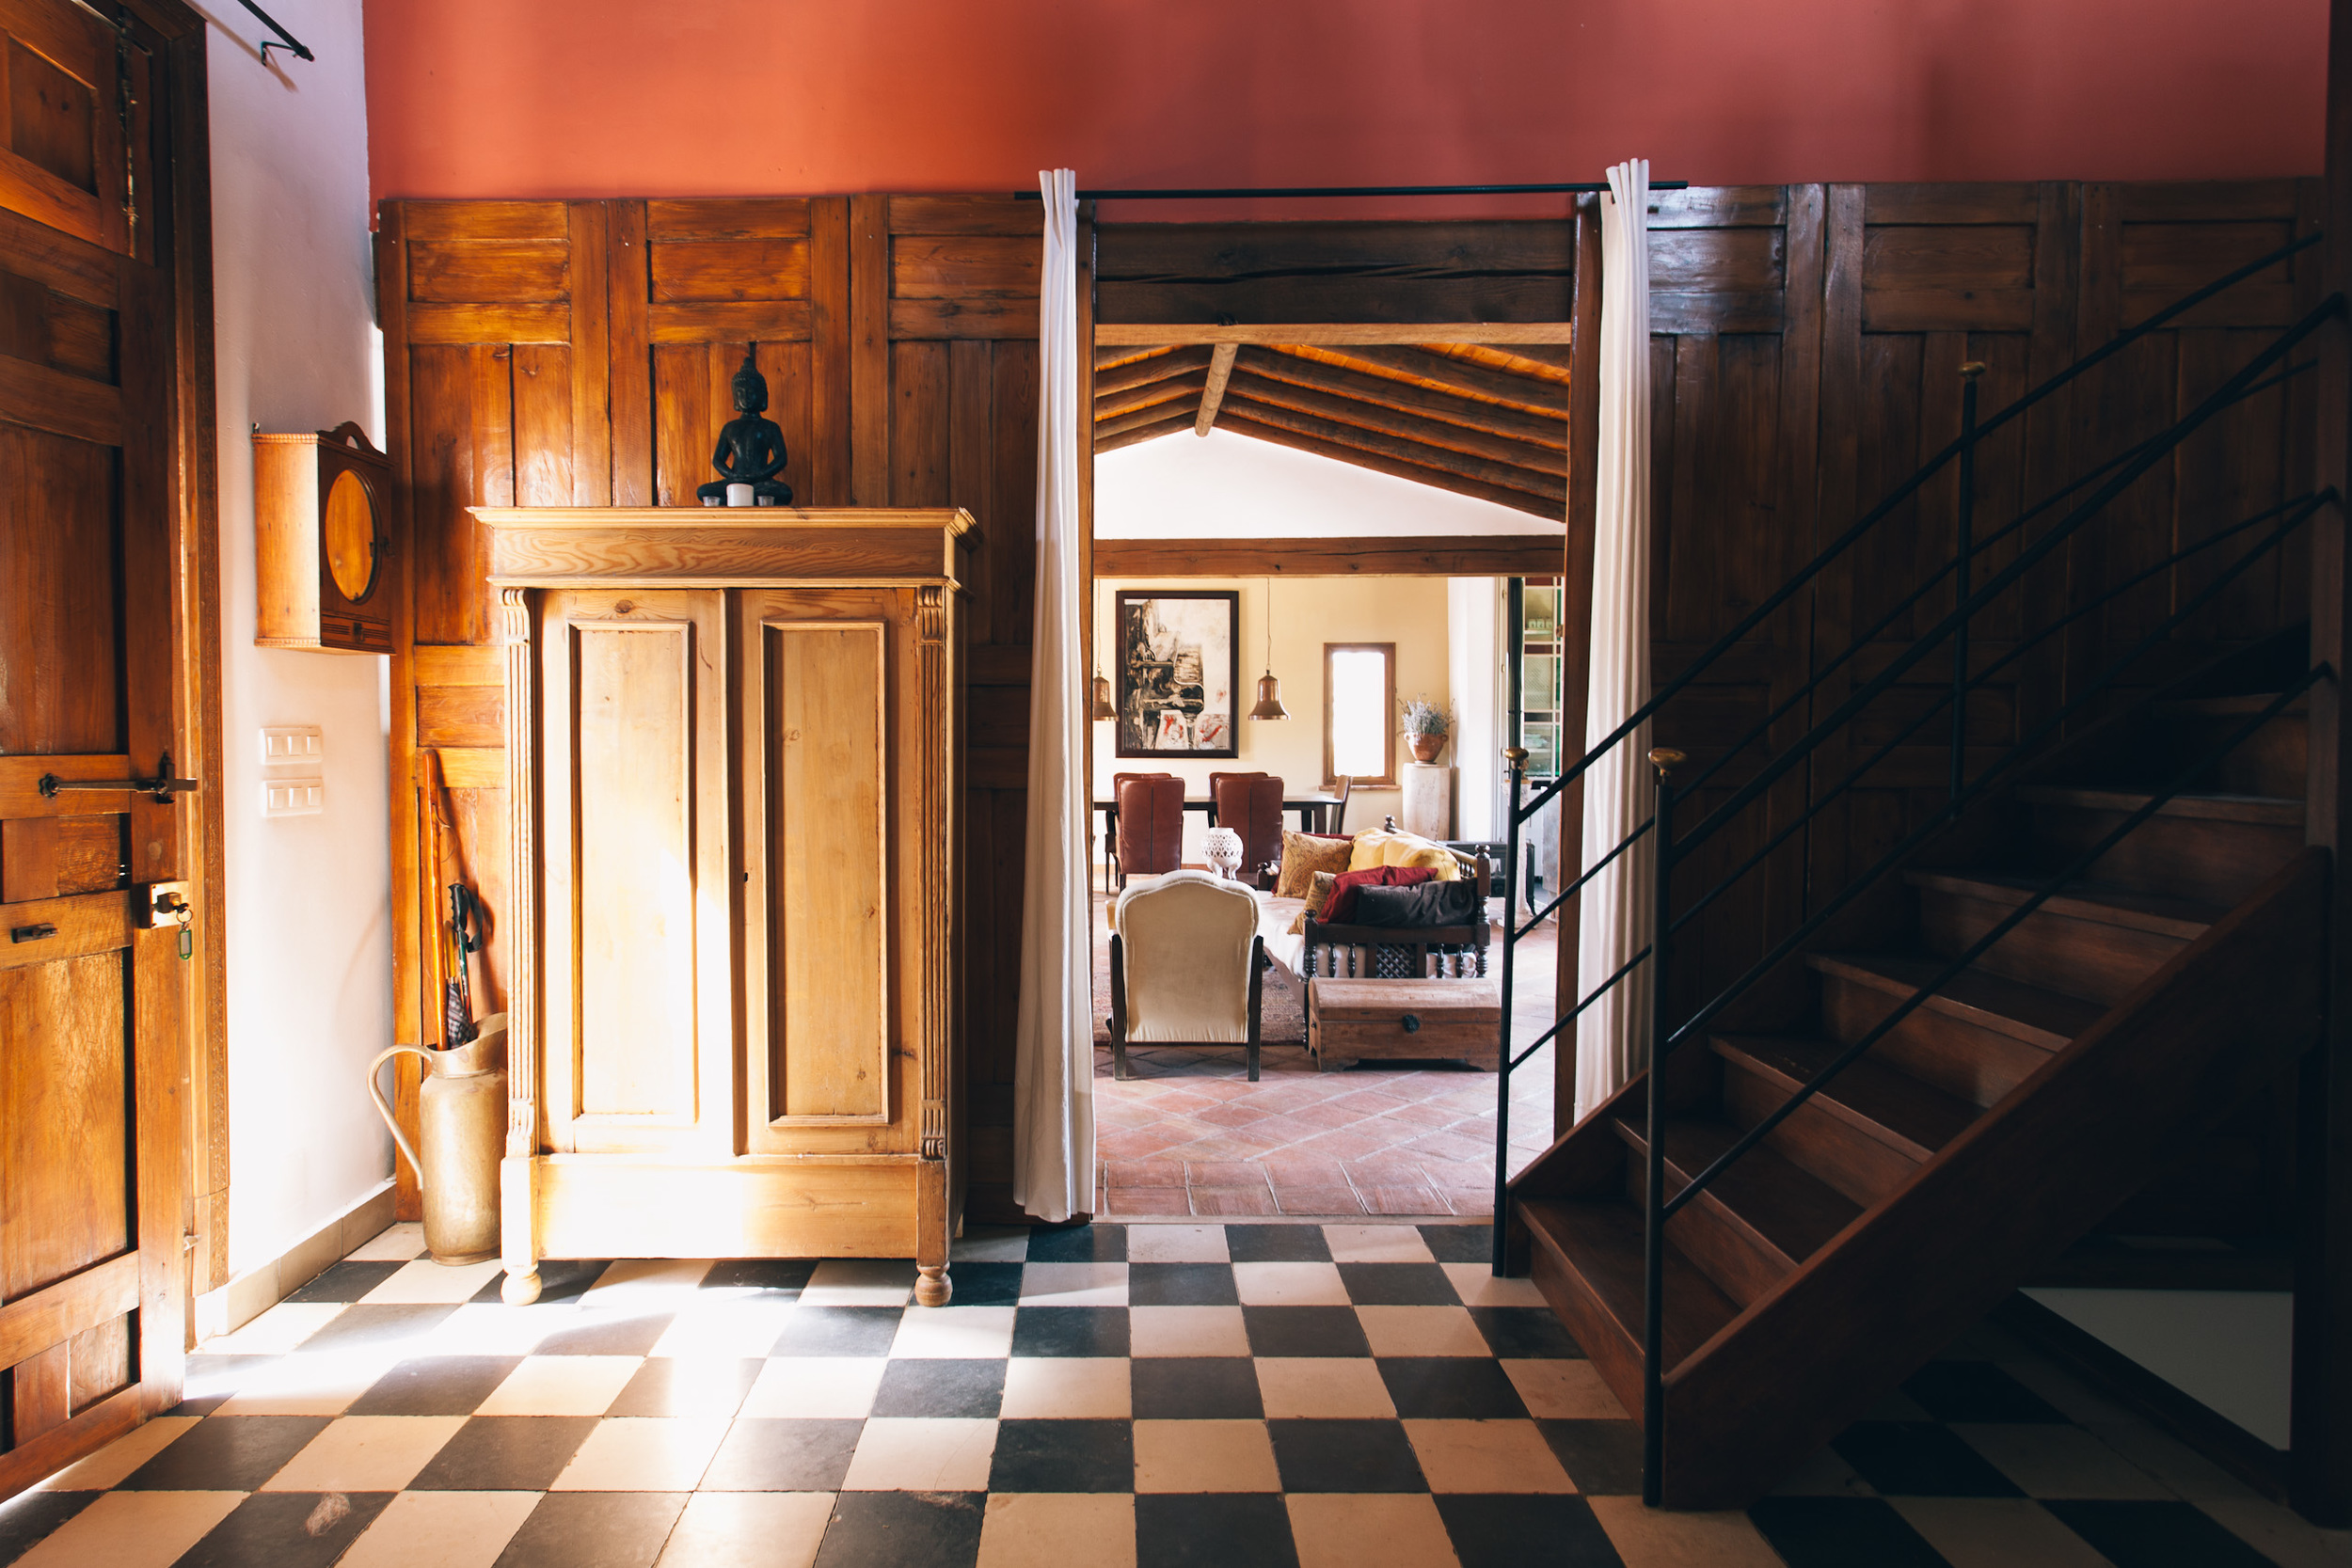 interieur-5.jpg